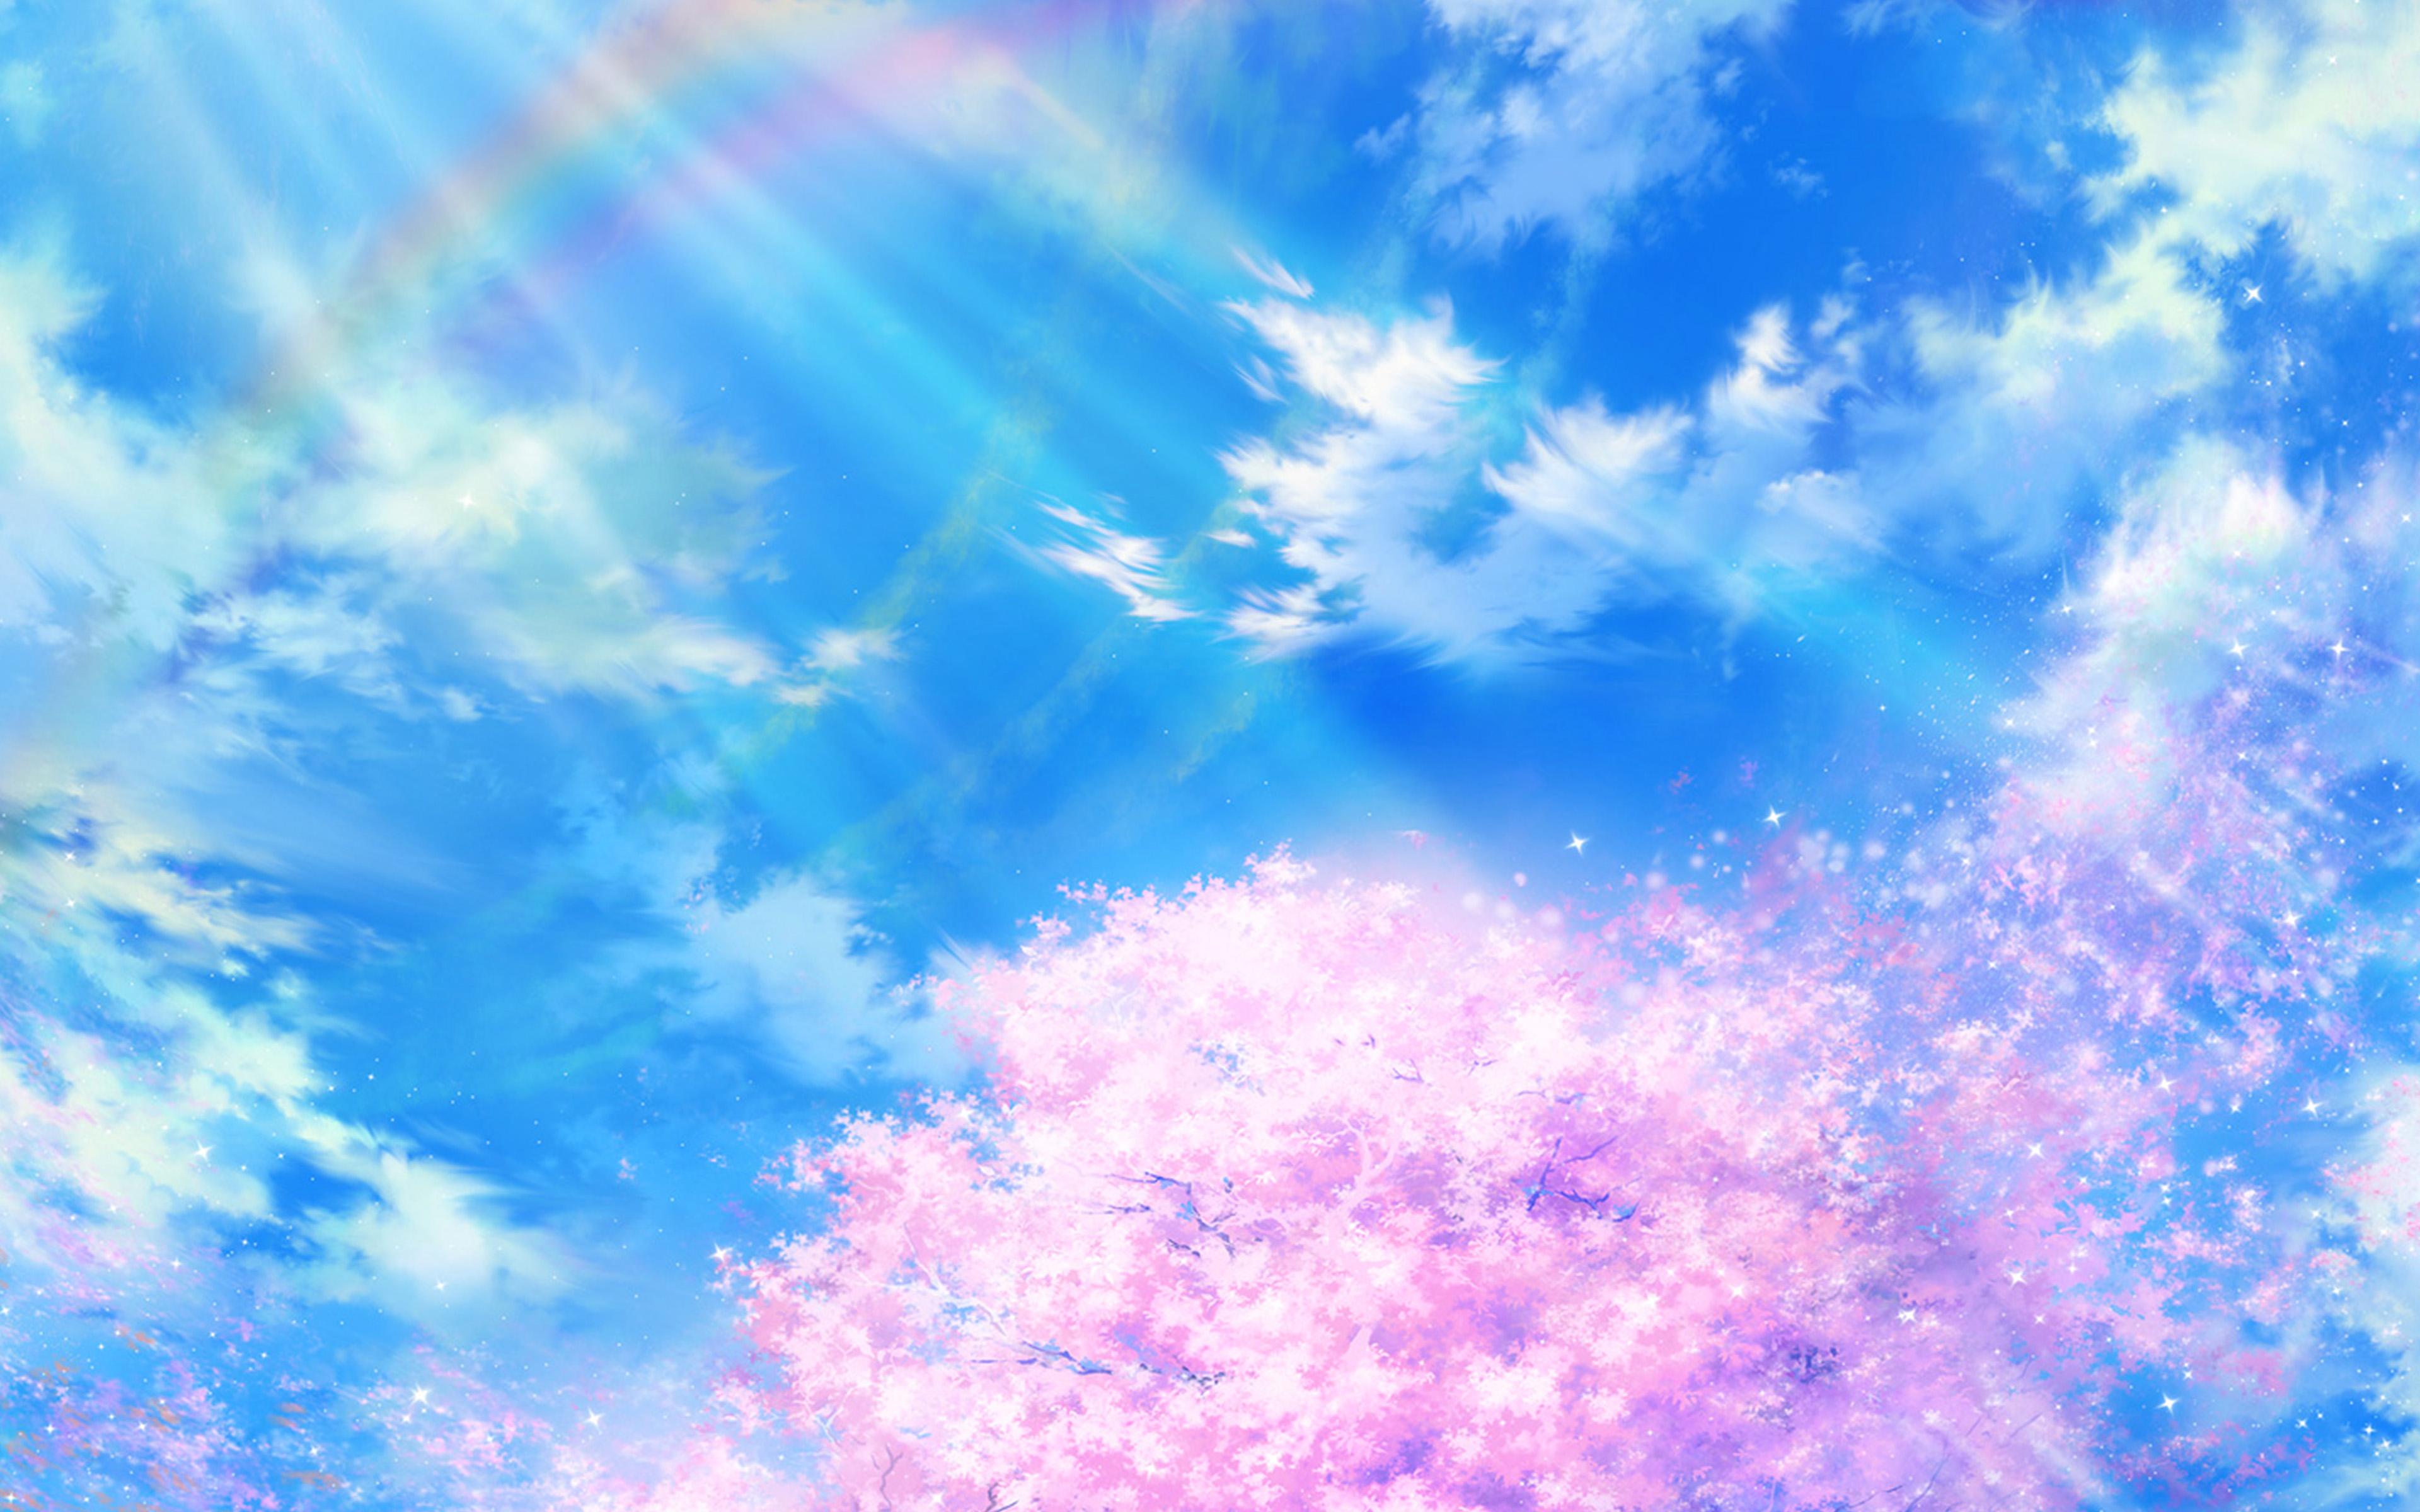 Wallpaper For Desktop Laptop Bd75 Anime Sky Cloud Spring